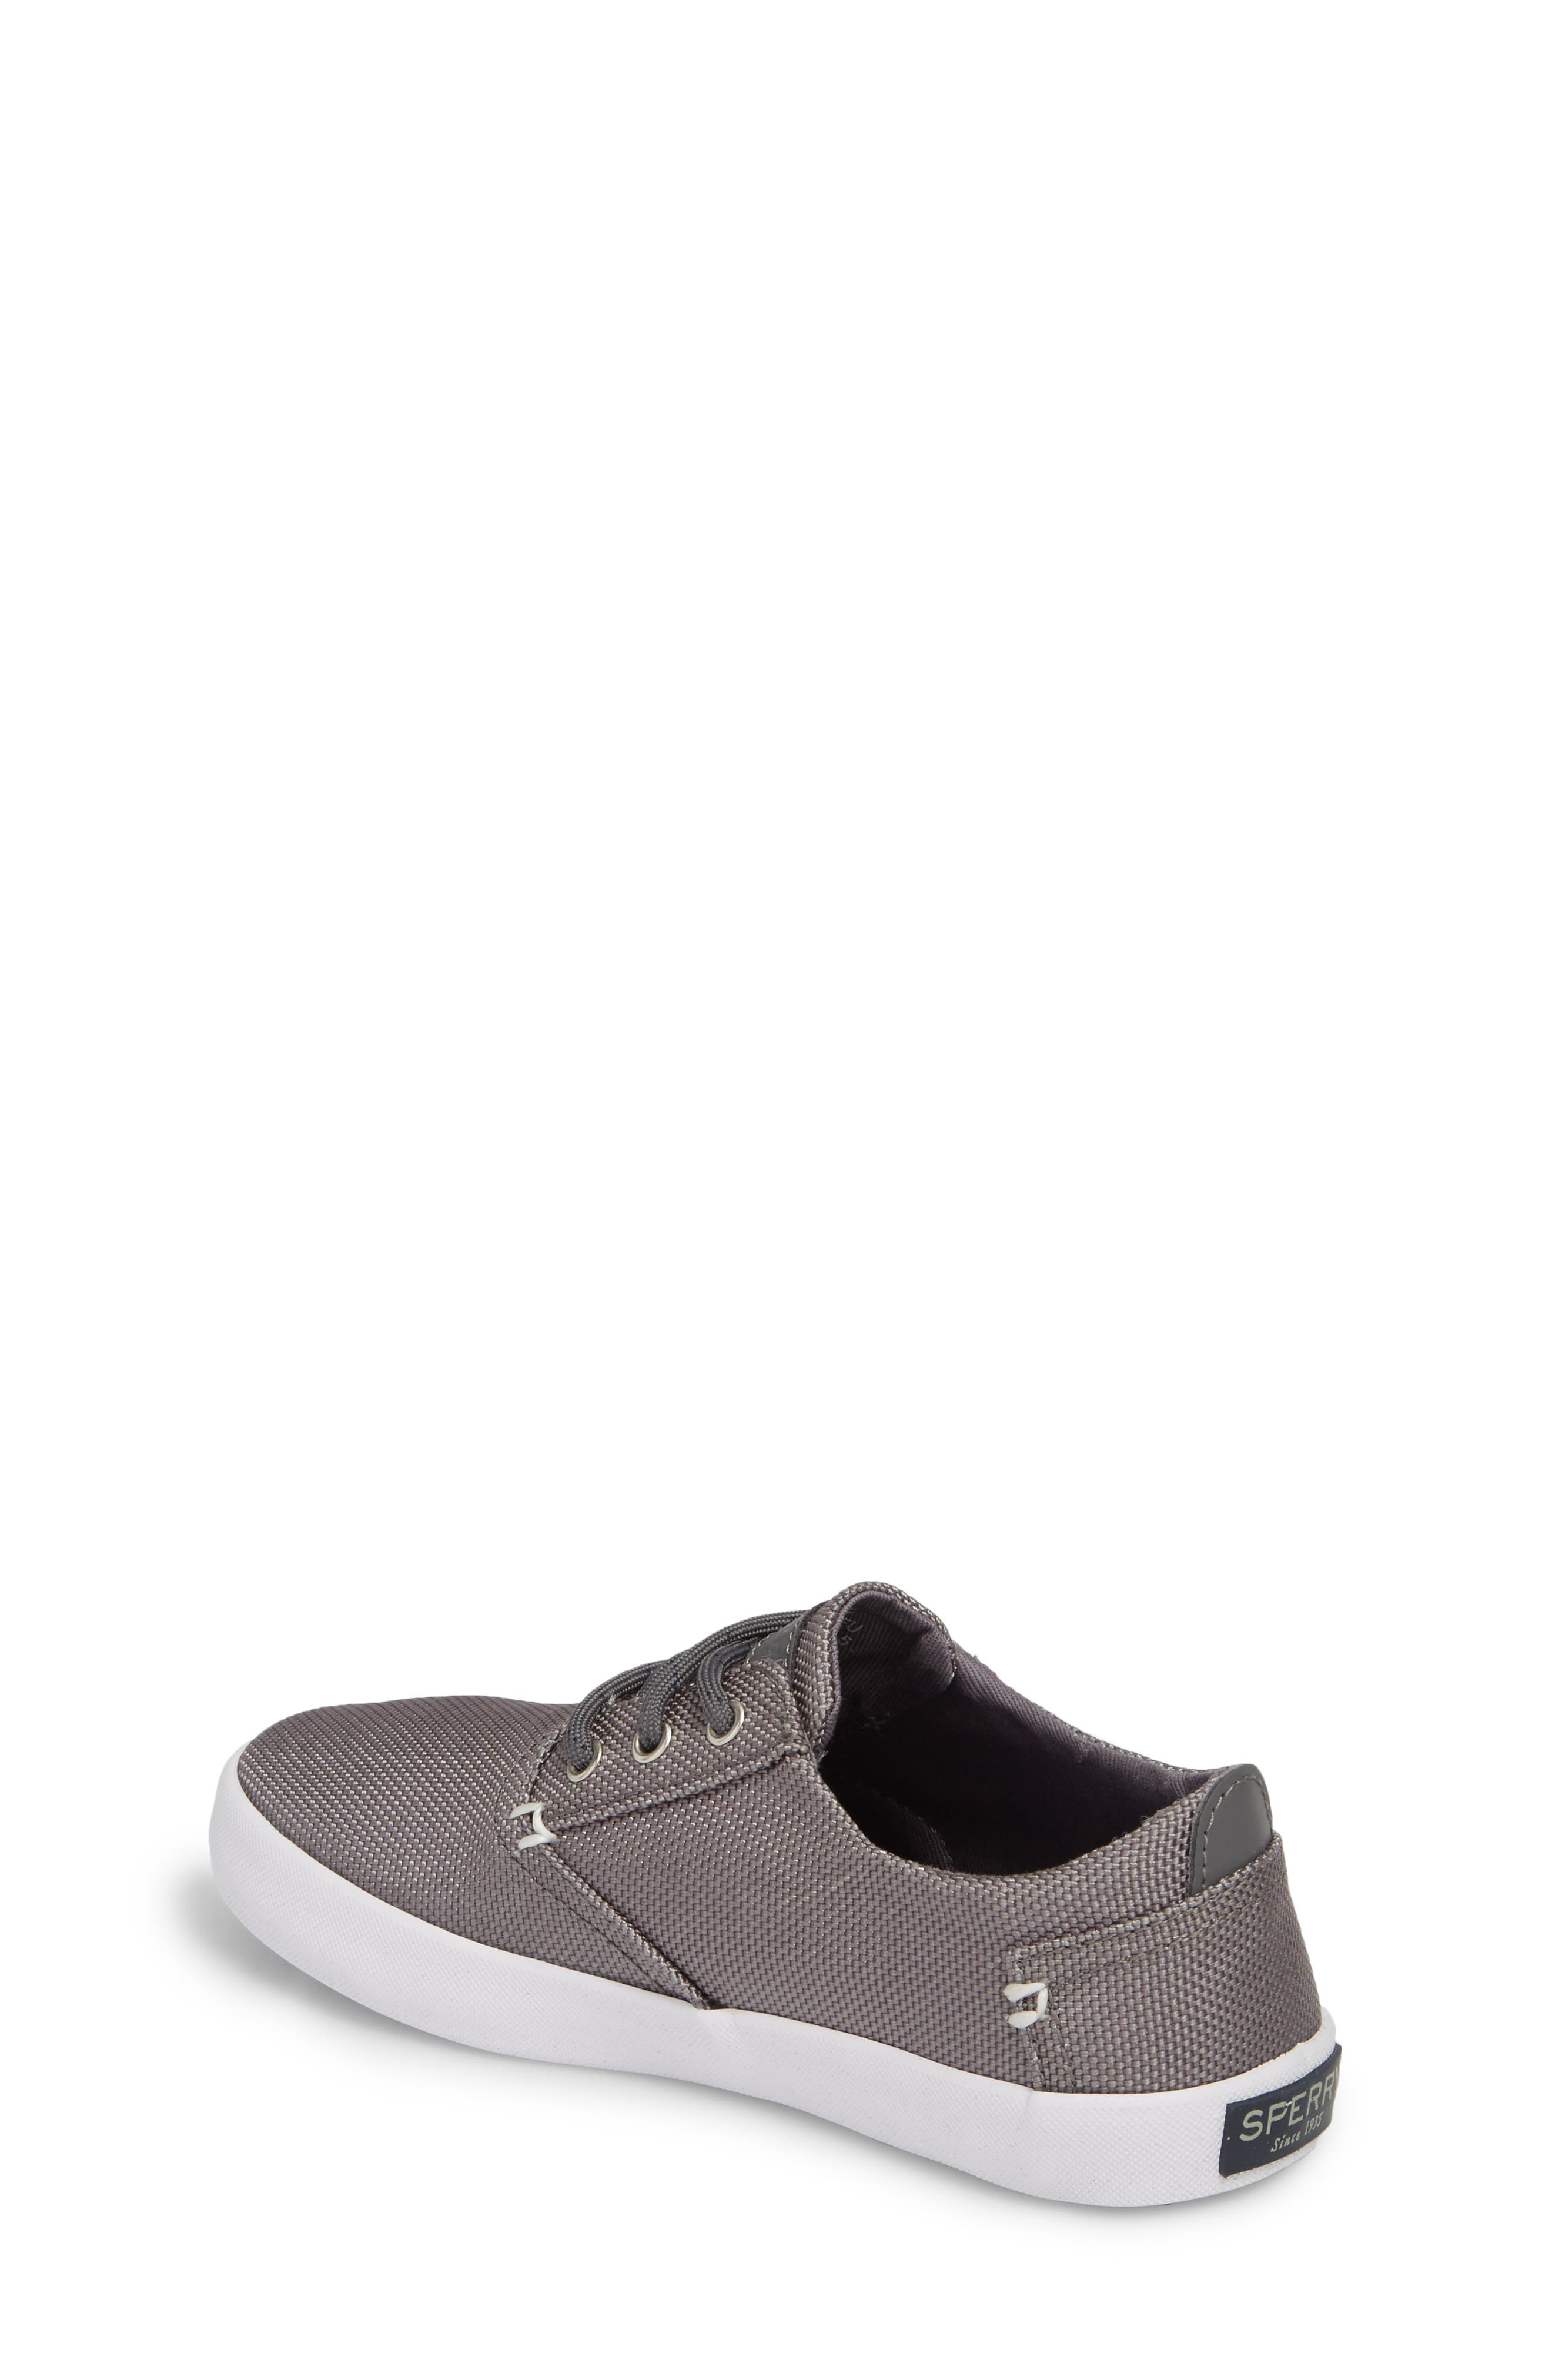 Bodie Sneaker,                             Alternate thumbnail 2, color,                             GREY